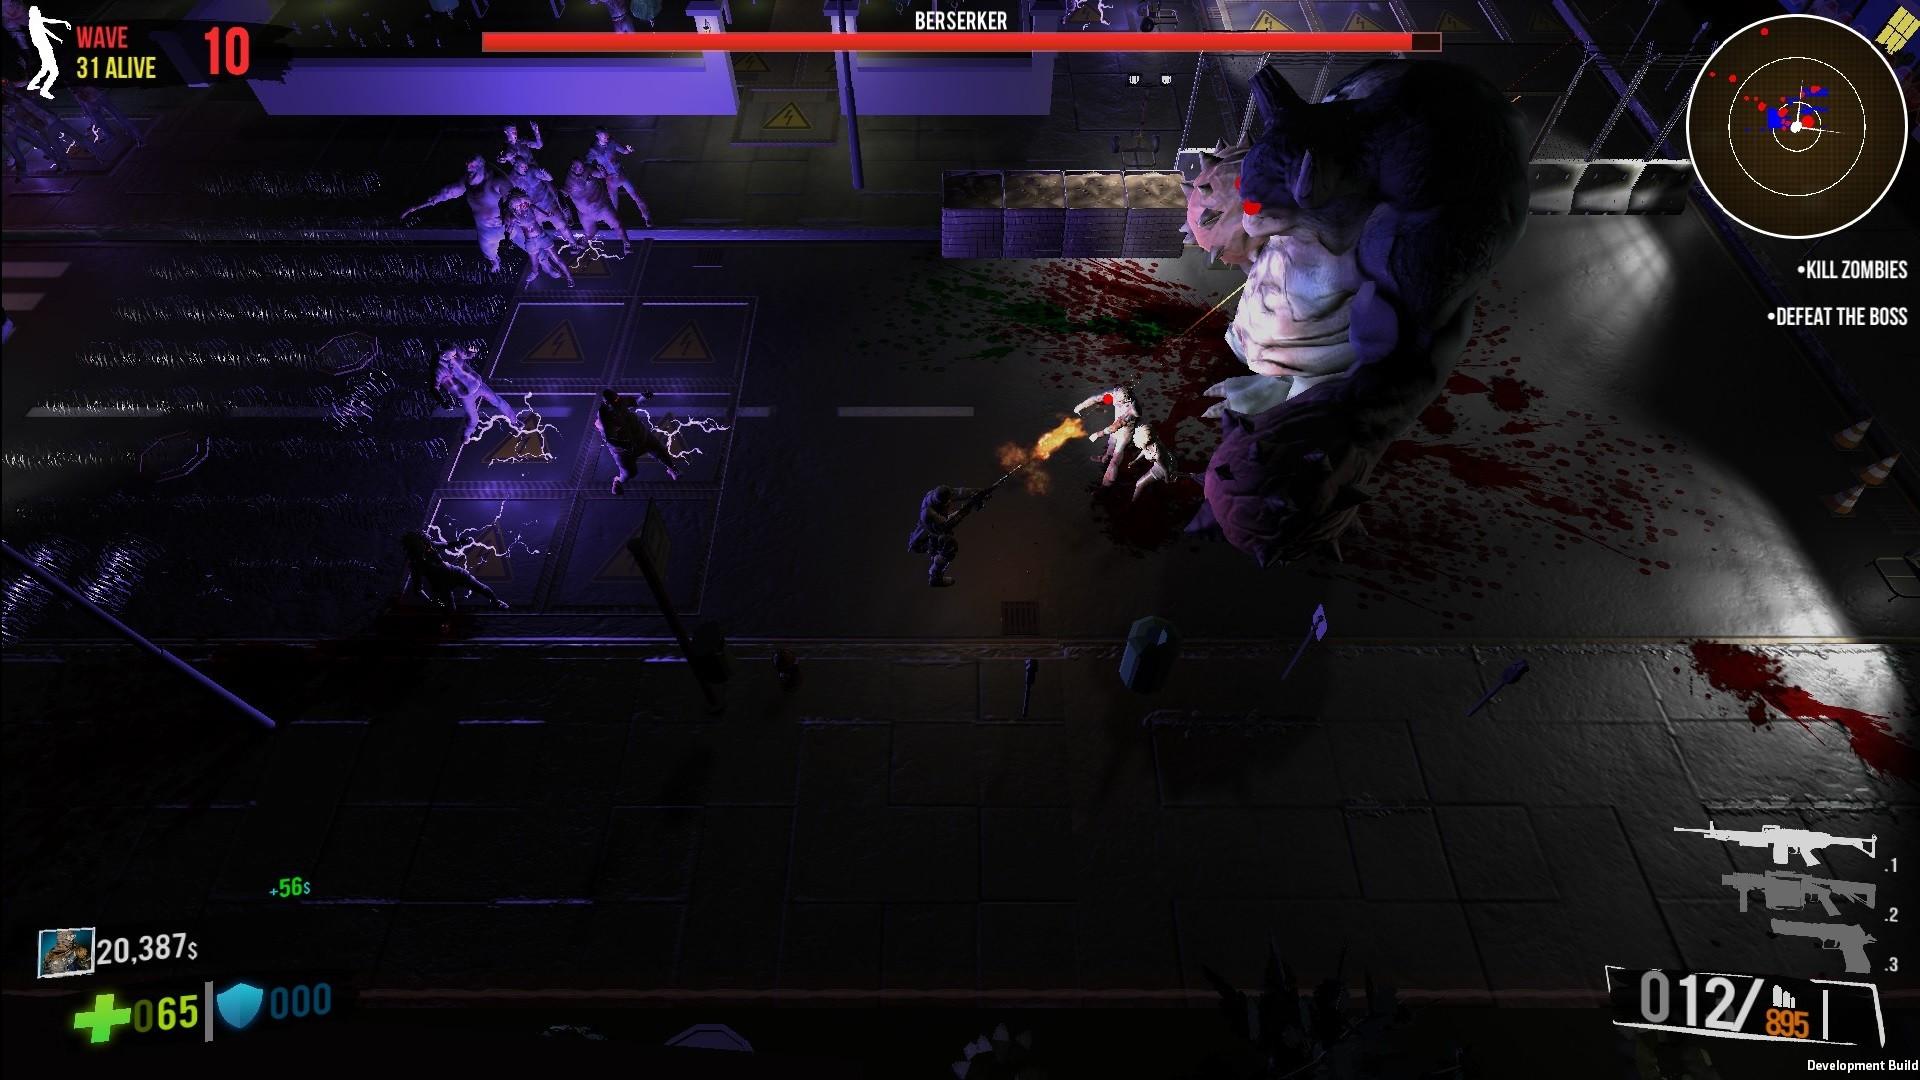 ultimate-zombie-defense-pc-screenshot-3